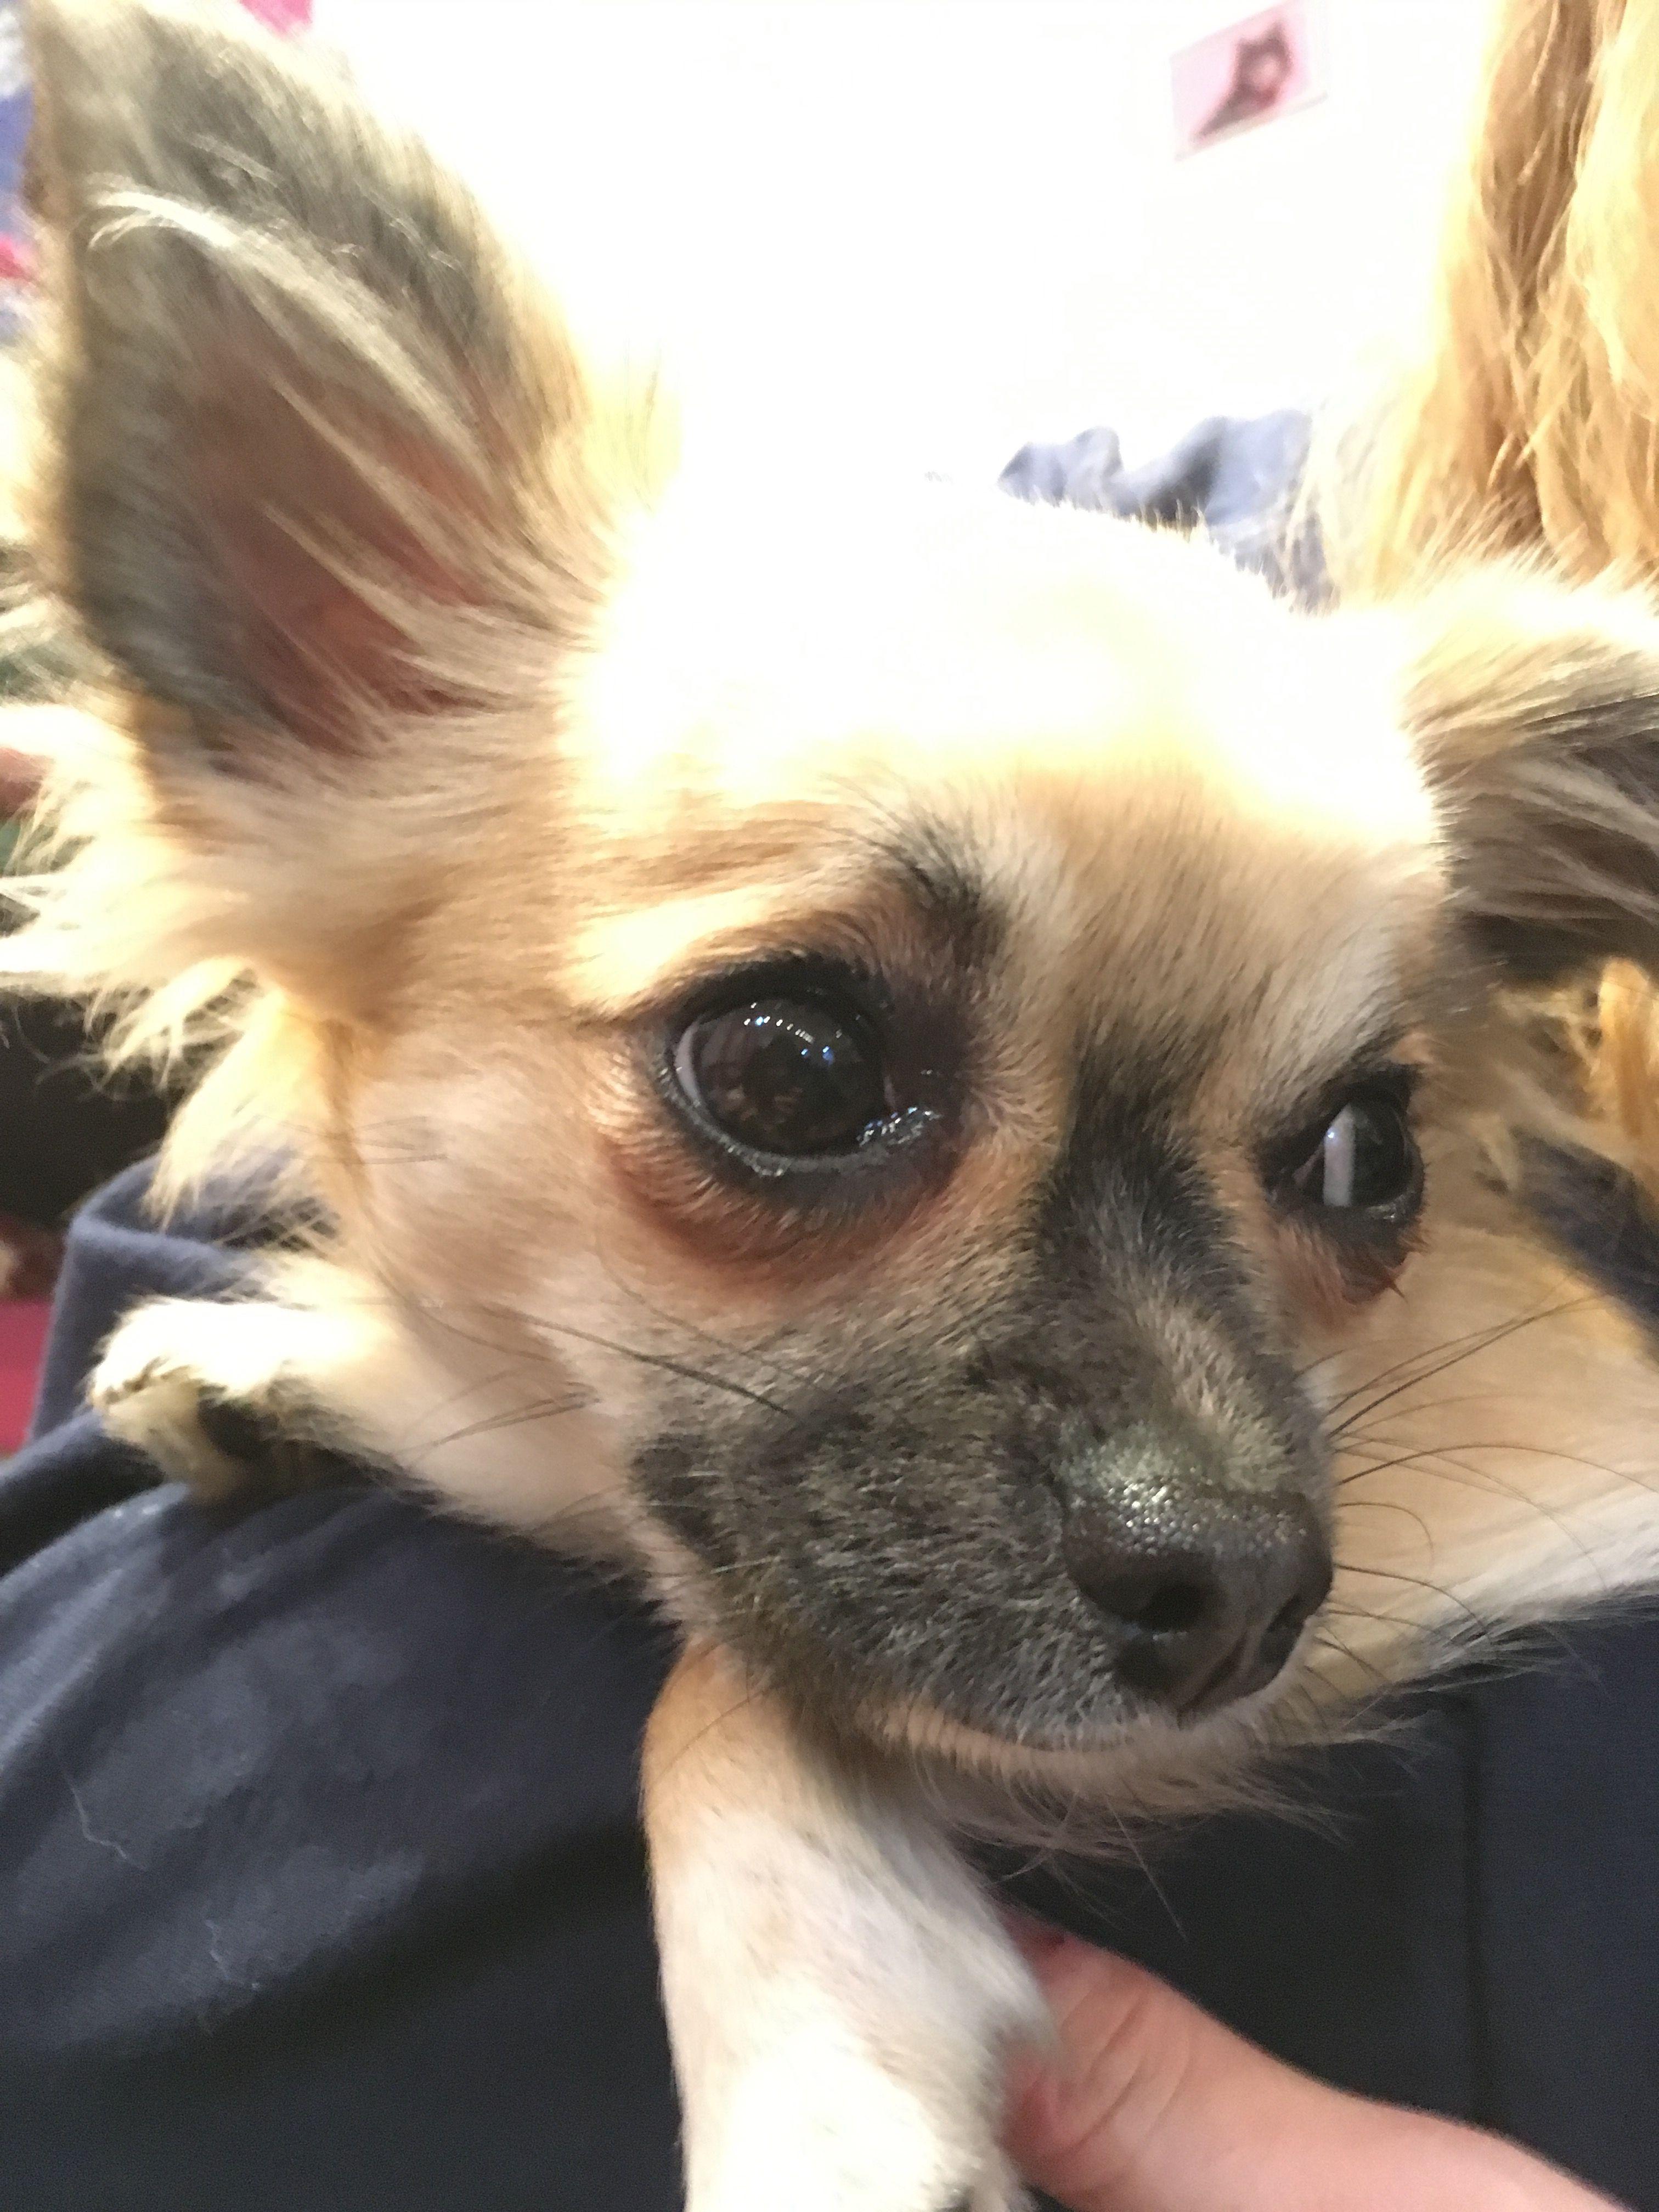 Image may contain: Spaniel, Papillon, Cocker Spaniel, Pet, Mammal, Dog, Chihuahua, Canine, Animal